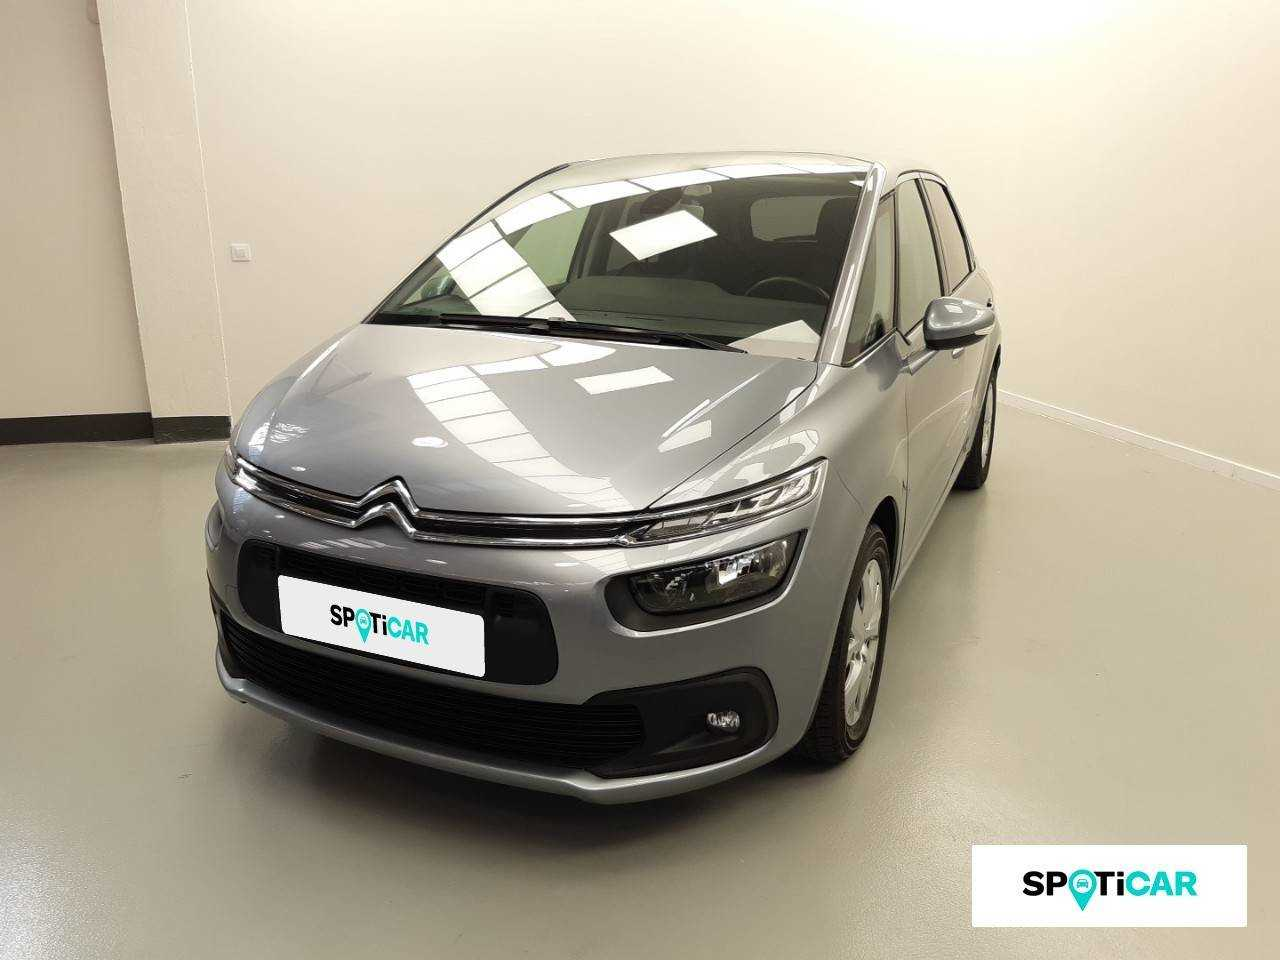 Citroën C4 Picasso ocasión segunda mano 2017 Diésel por 12.900€ en Sevilla